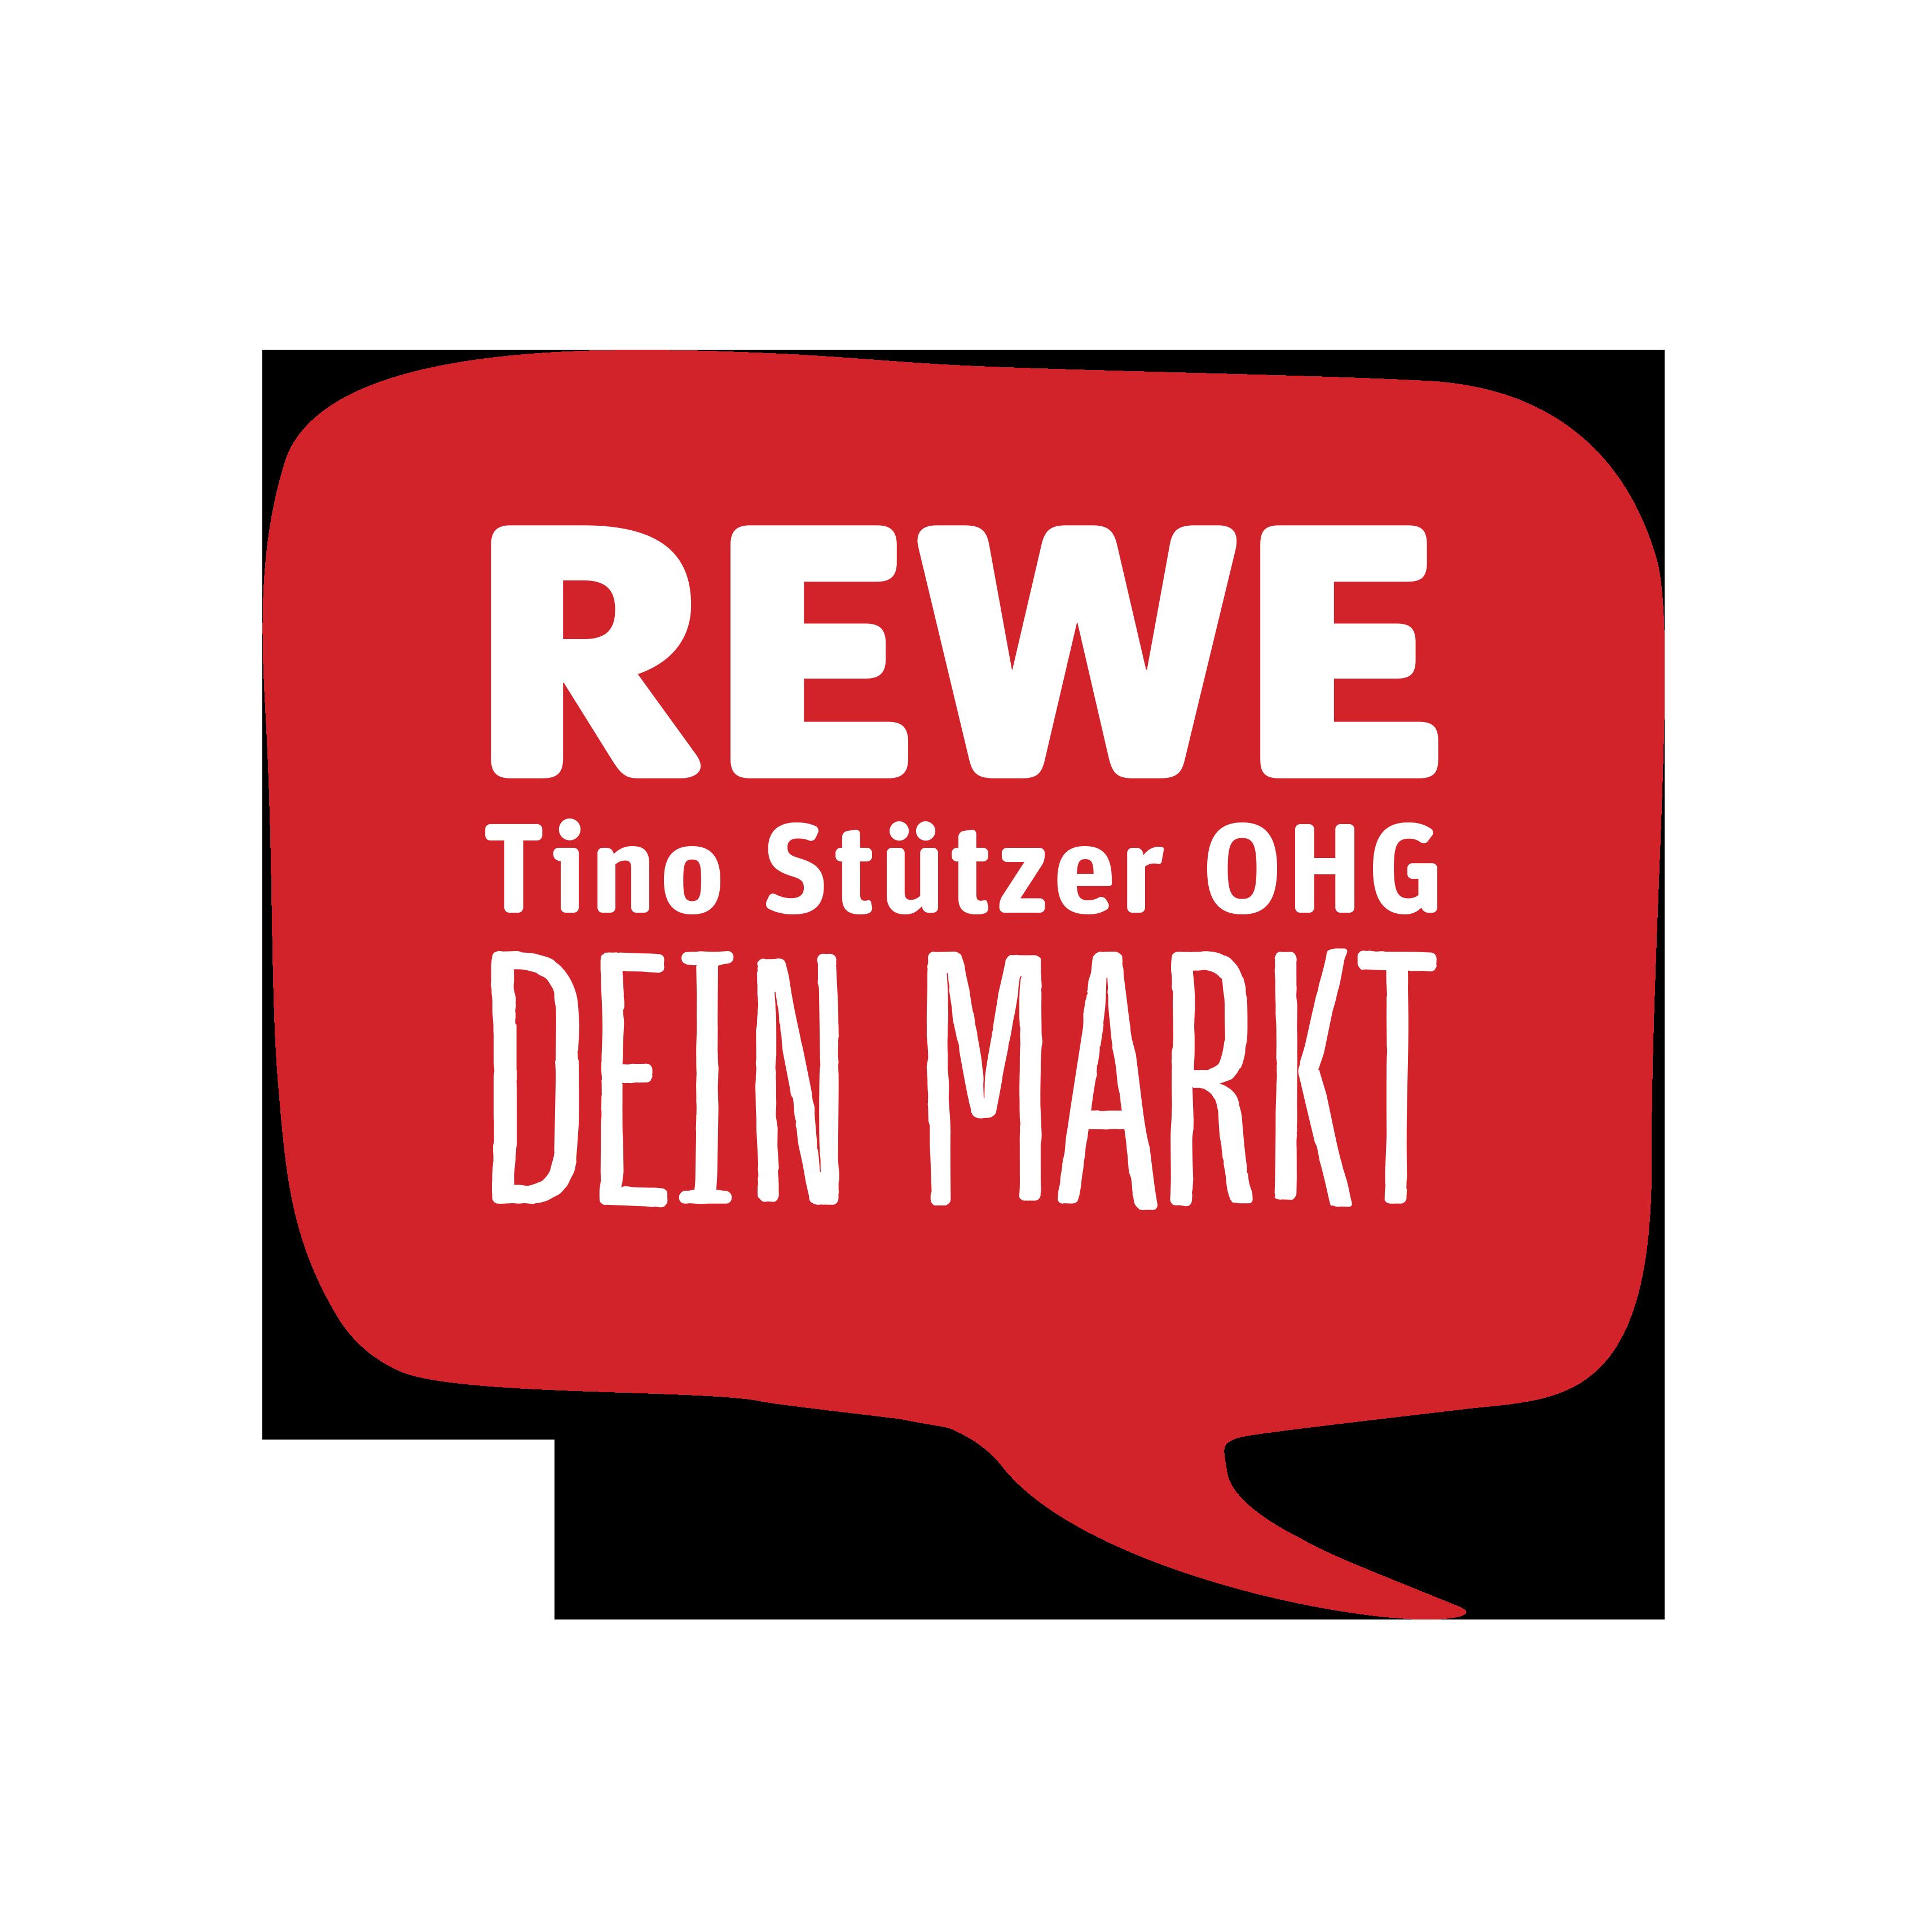 REWE Tino Stützer OHG